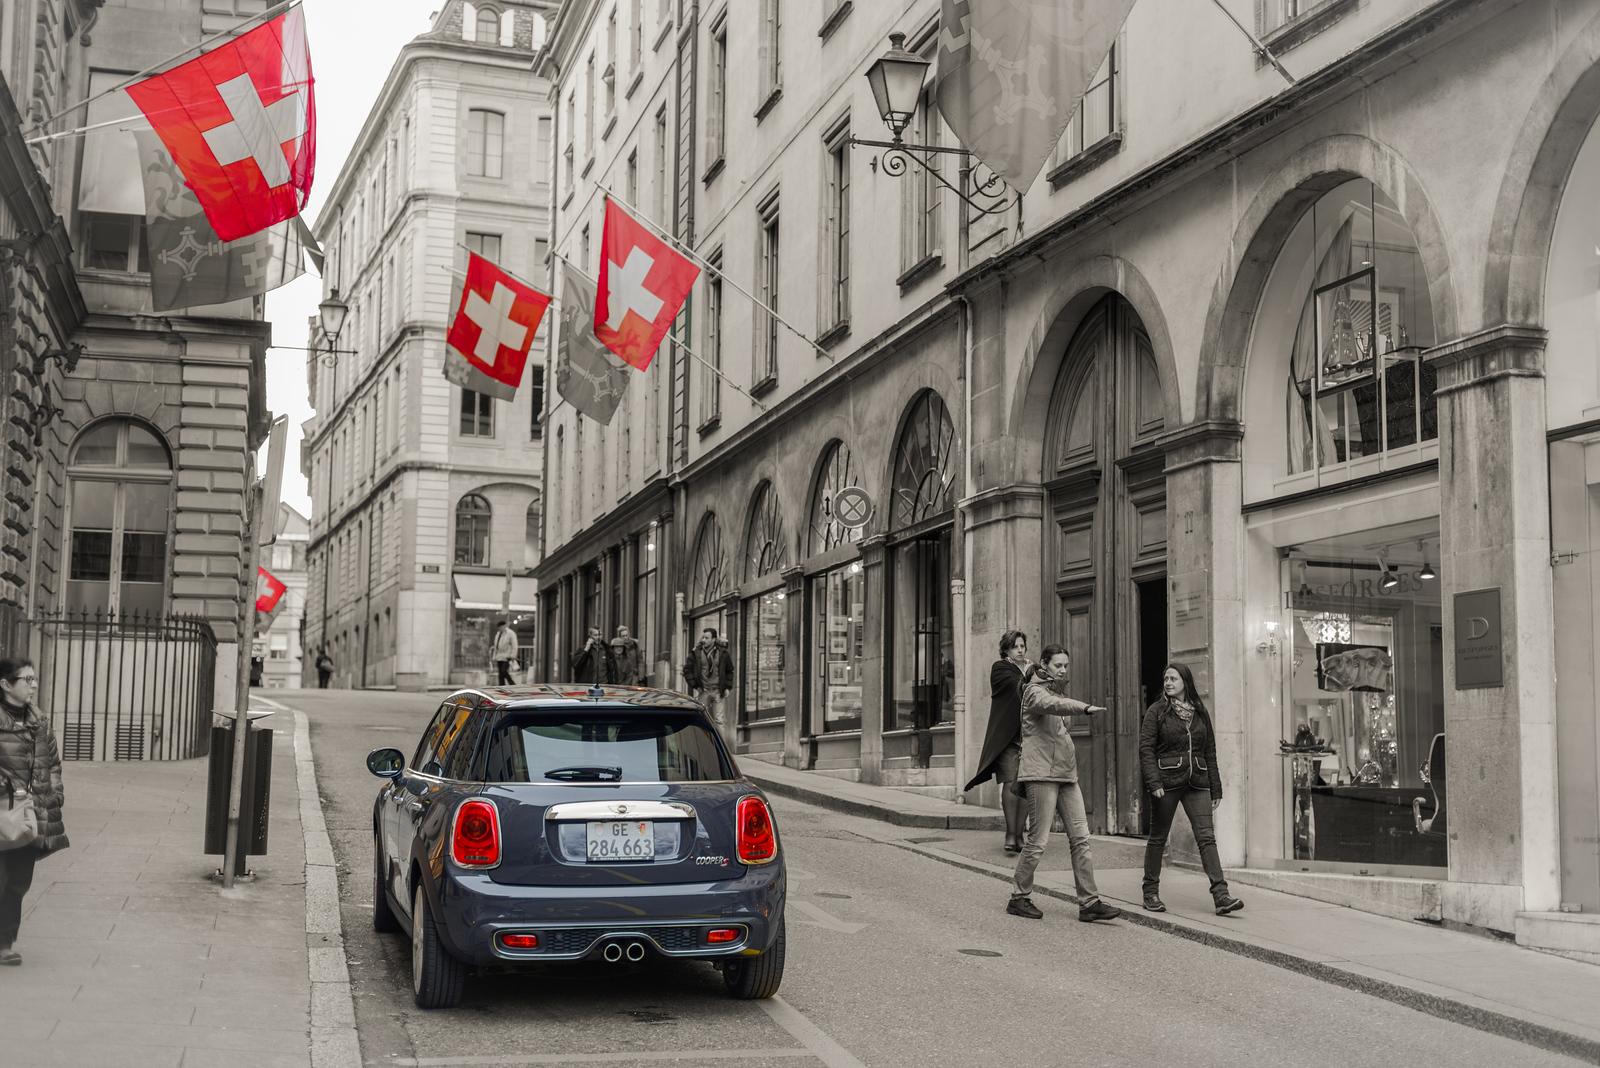 Swiss Flags and a Mini Cooper